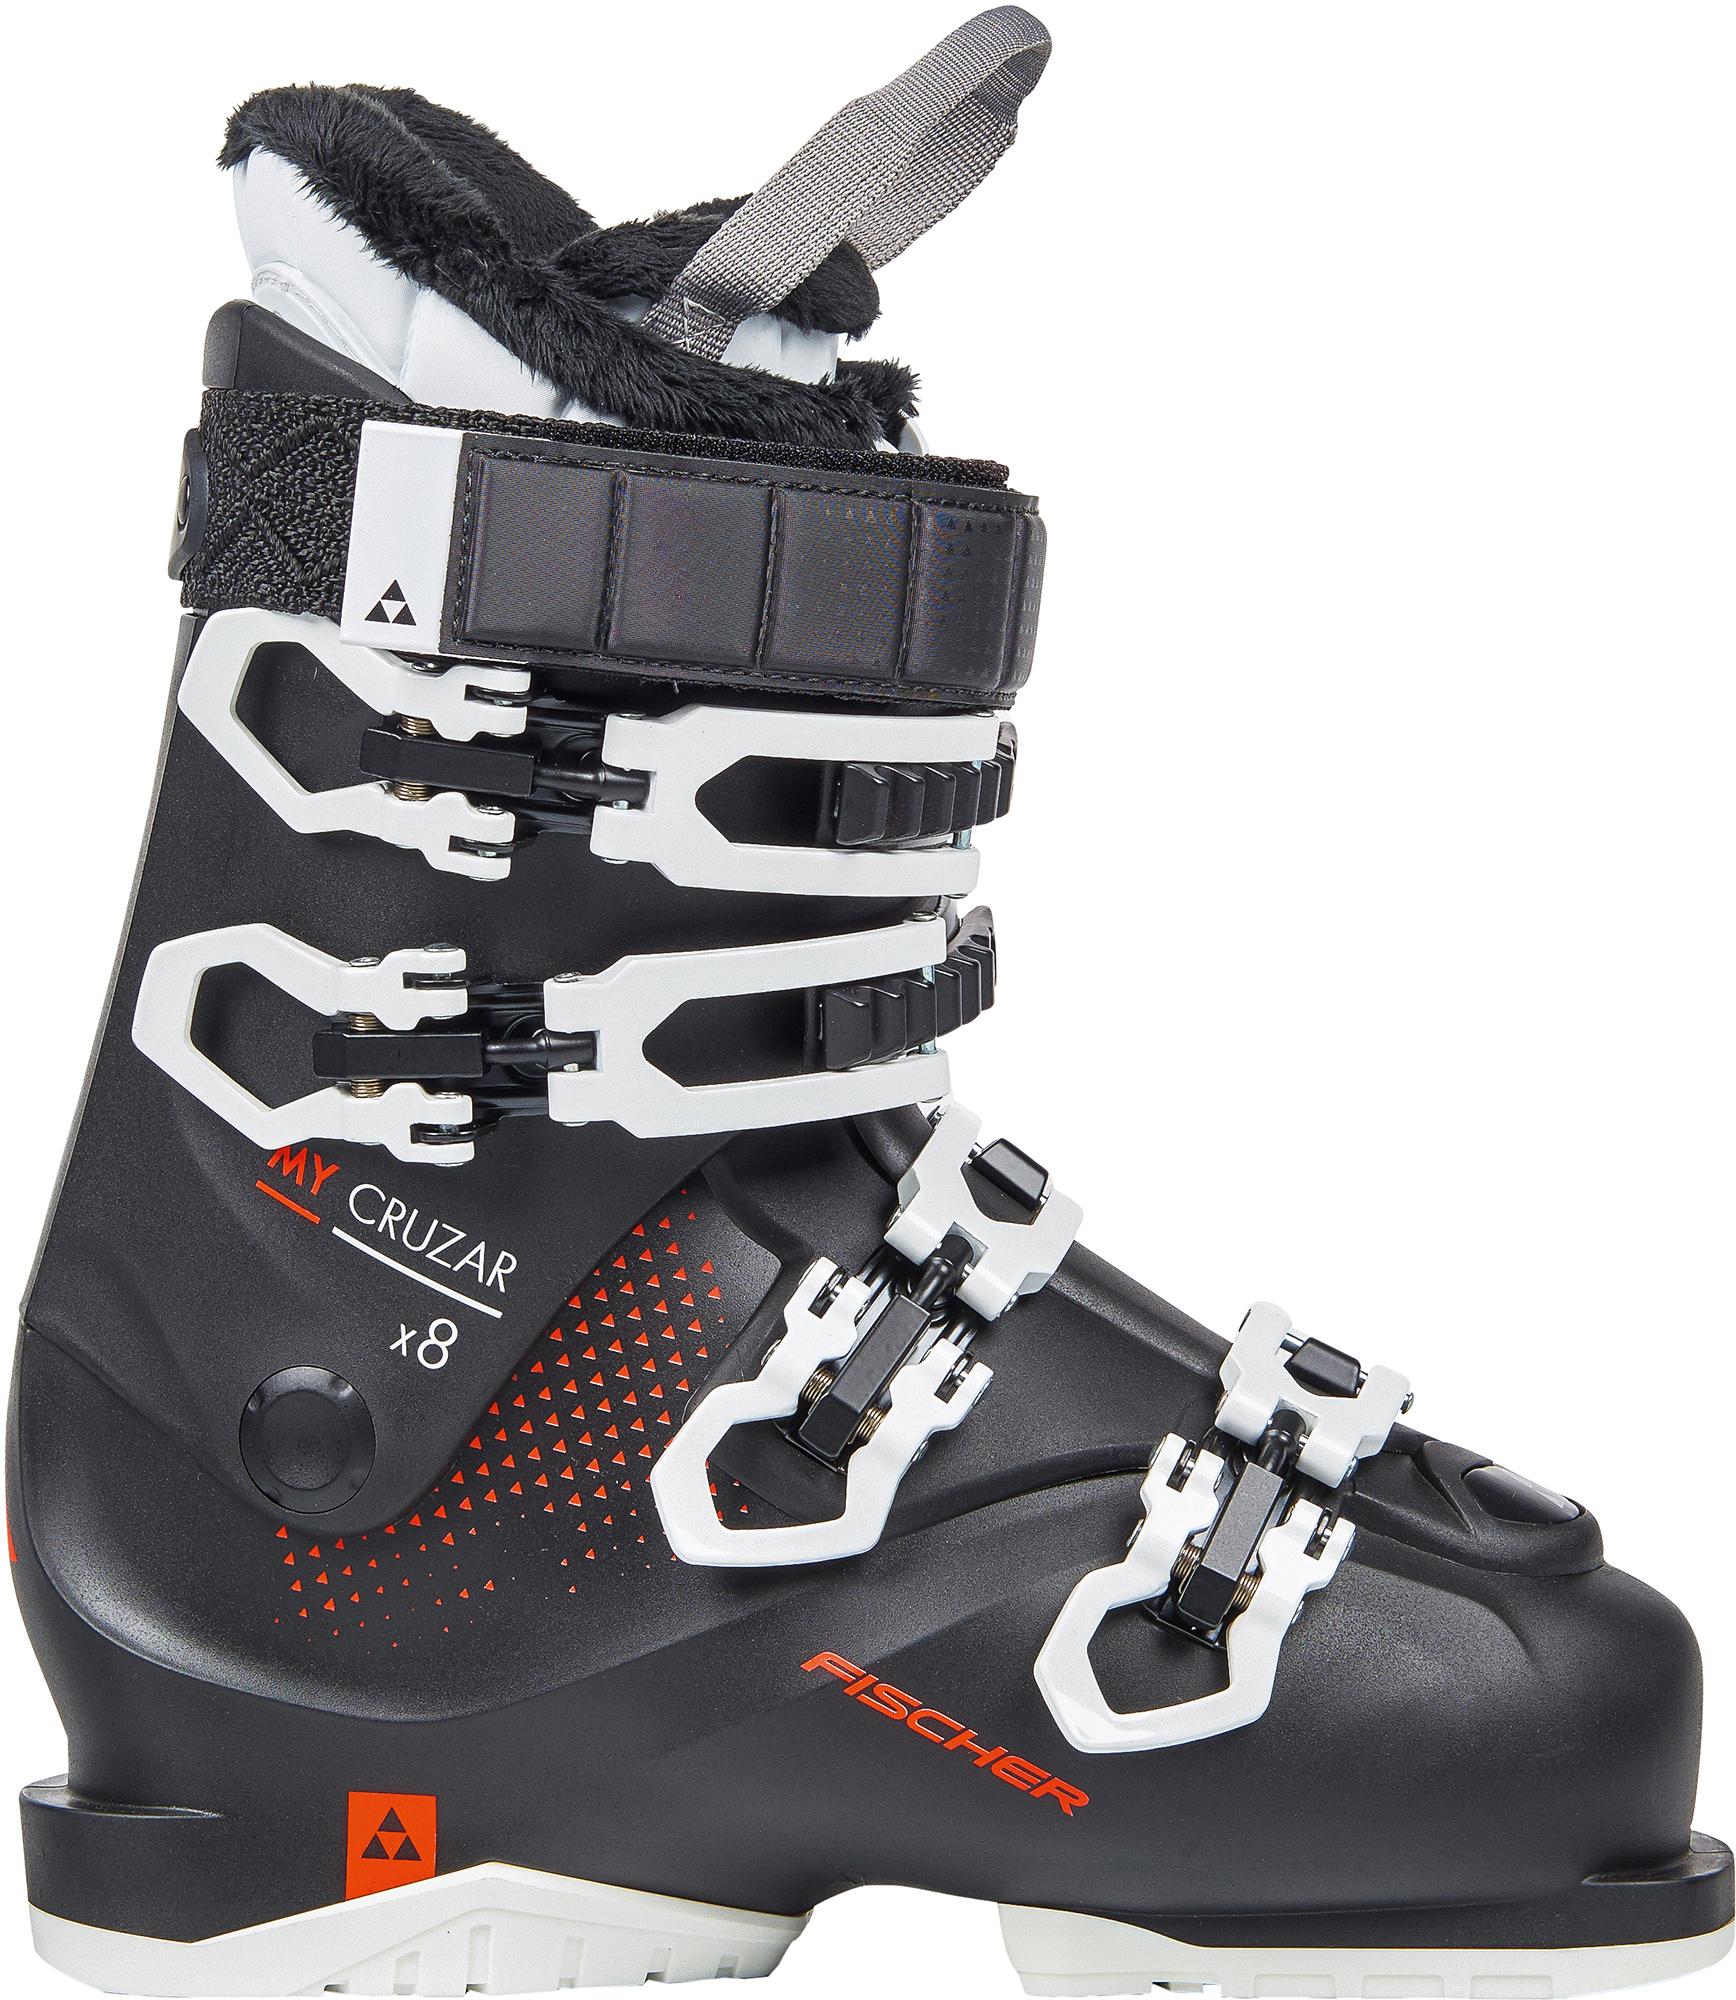 Fischer Ботинки горнолыжные женские MY CRUZAR X 8.0, размер 27,5 см